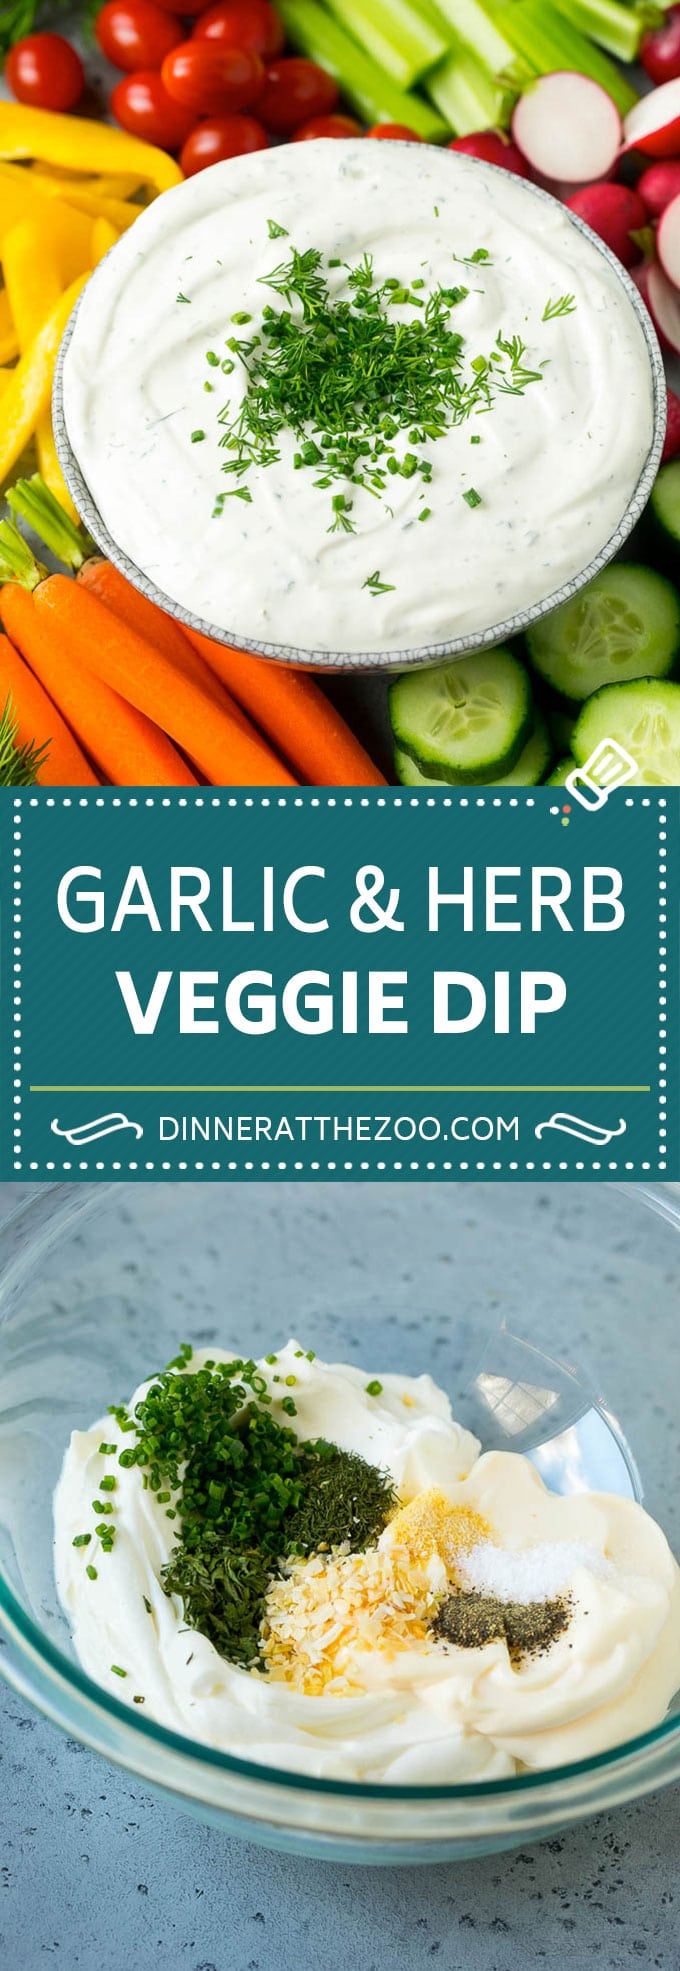 Veggie Dip Recipe   Garlic & Herb Dip   Vegetable Dip #dip #appetizer #lowcarb #keto #vegetables #dinneratthezoo